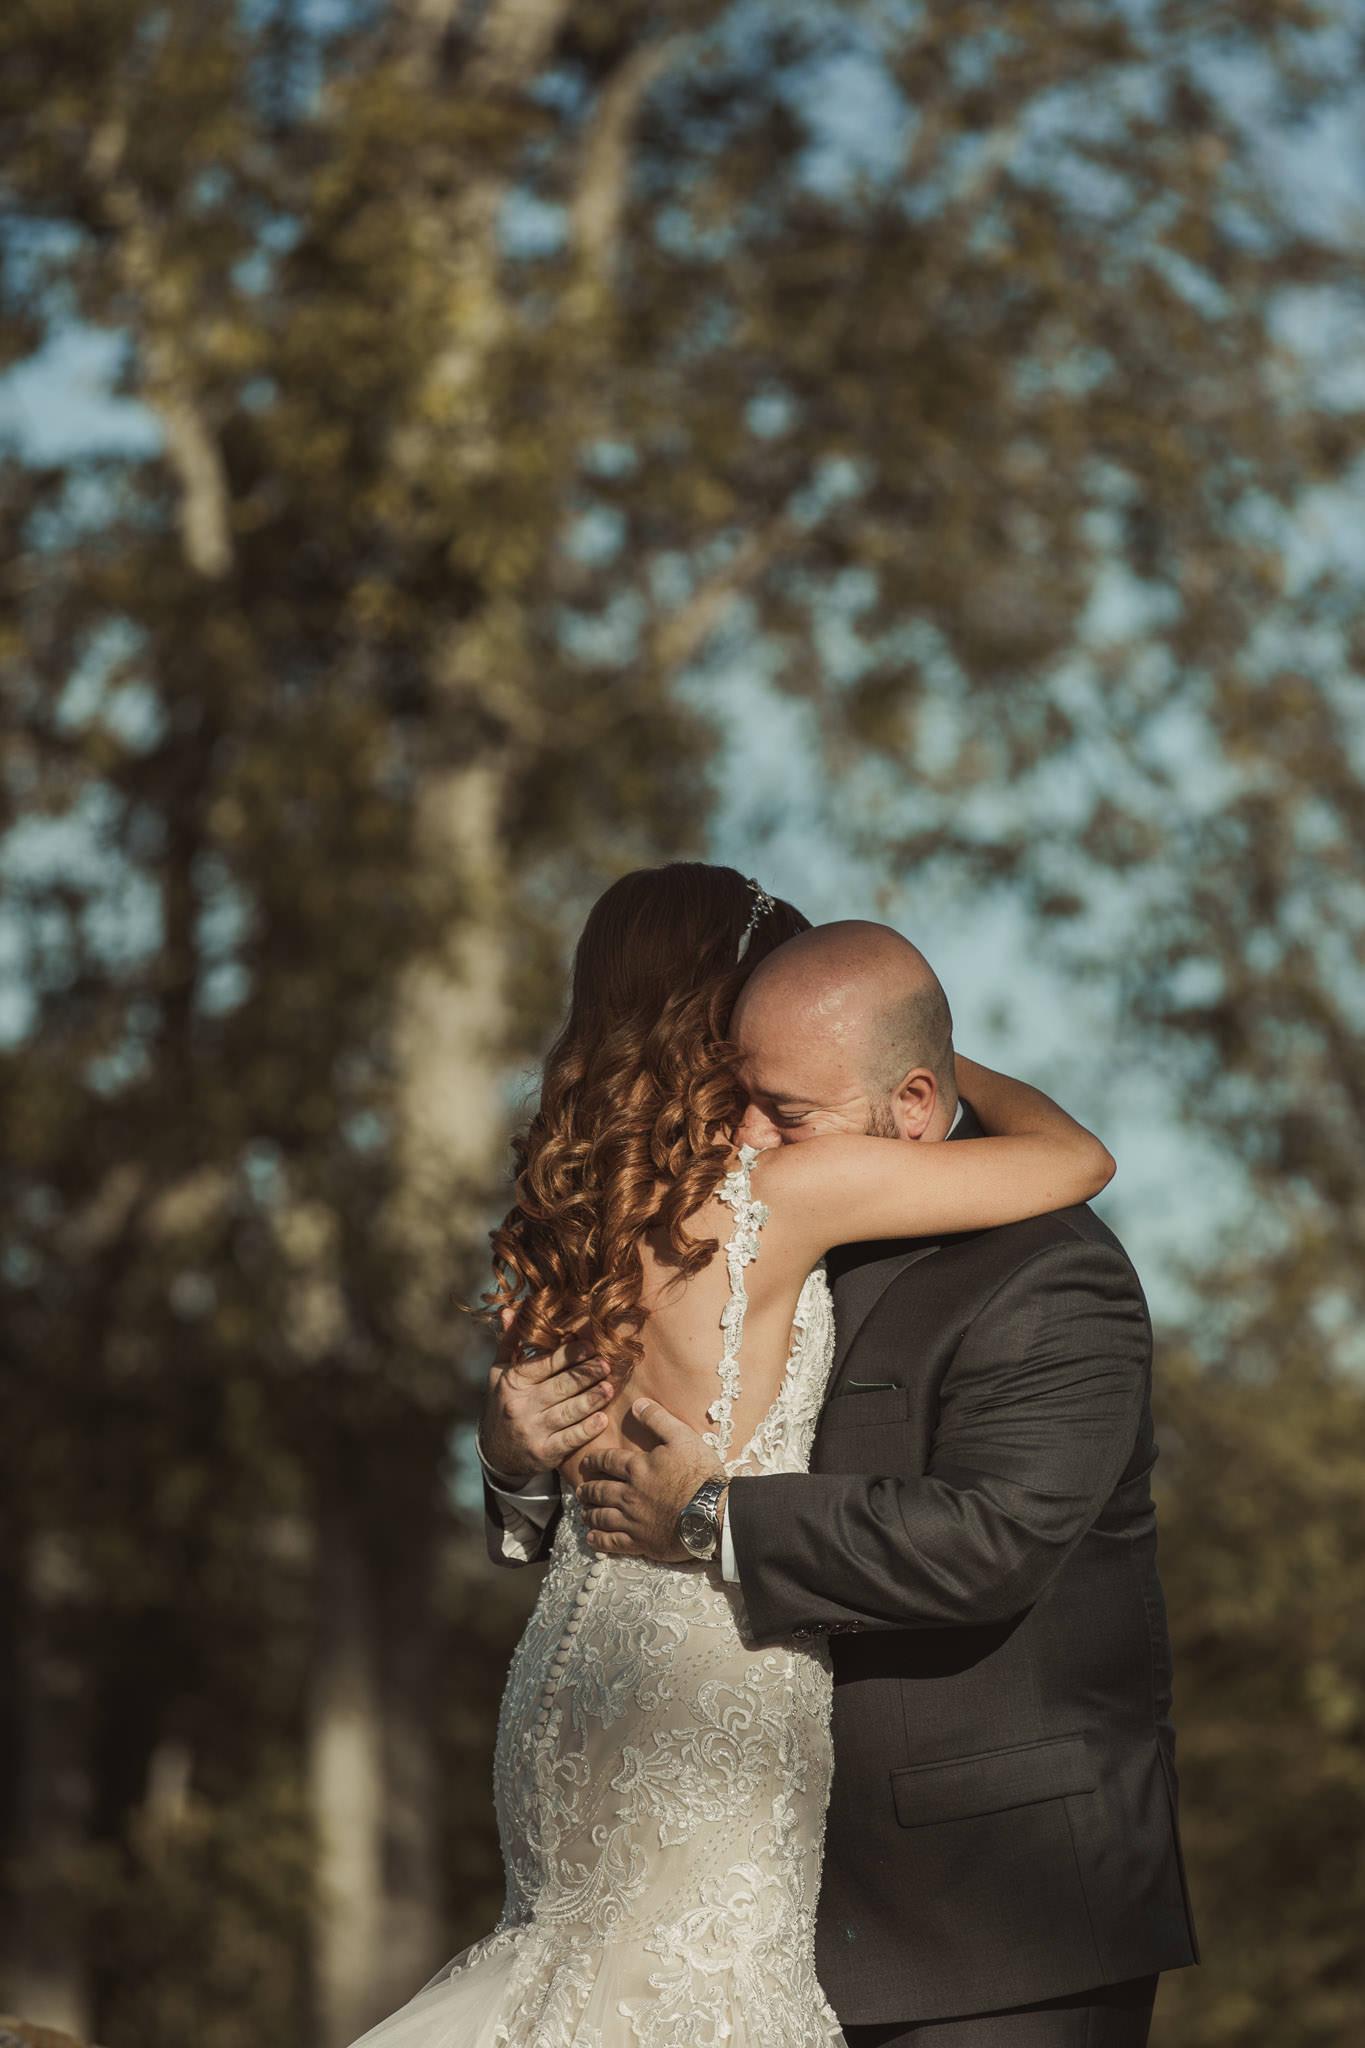 Cynthia-Curtis-Olde-Dobbine-Station-Houston-Wedding-Photographer-sm-46.jpg